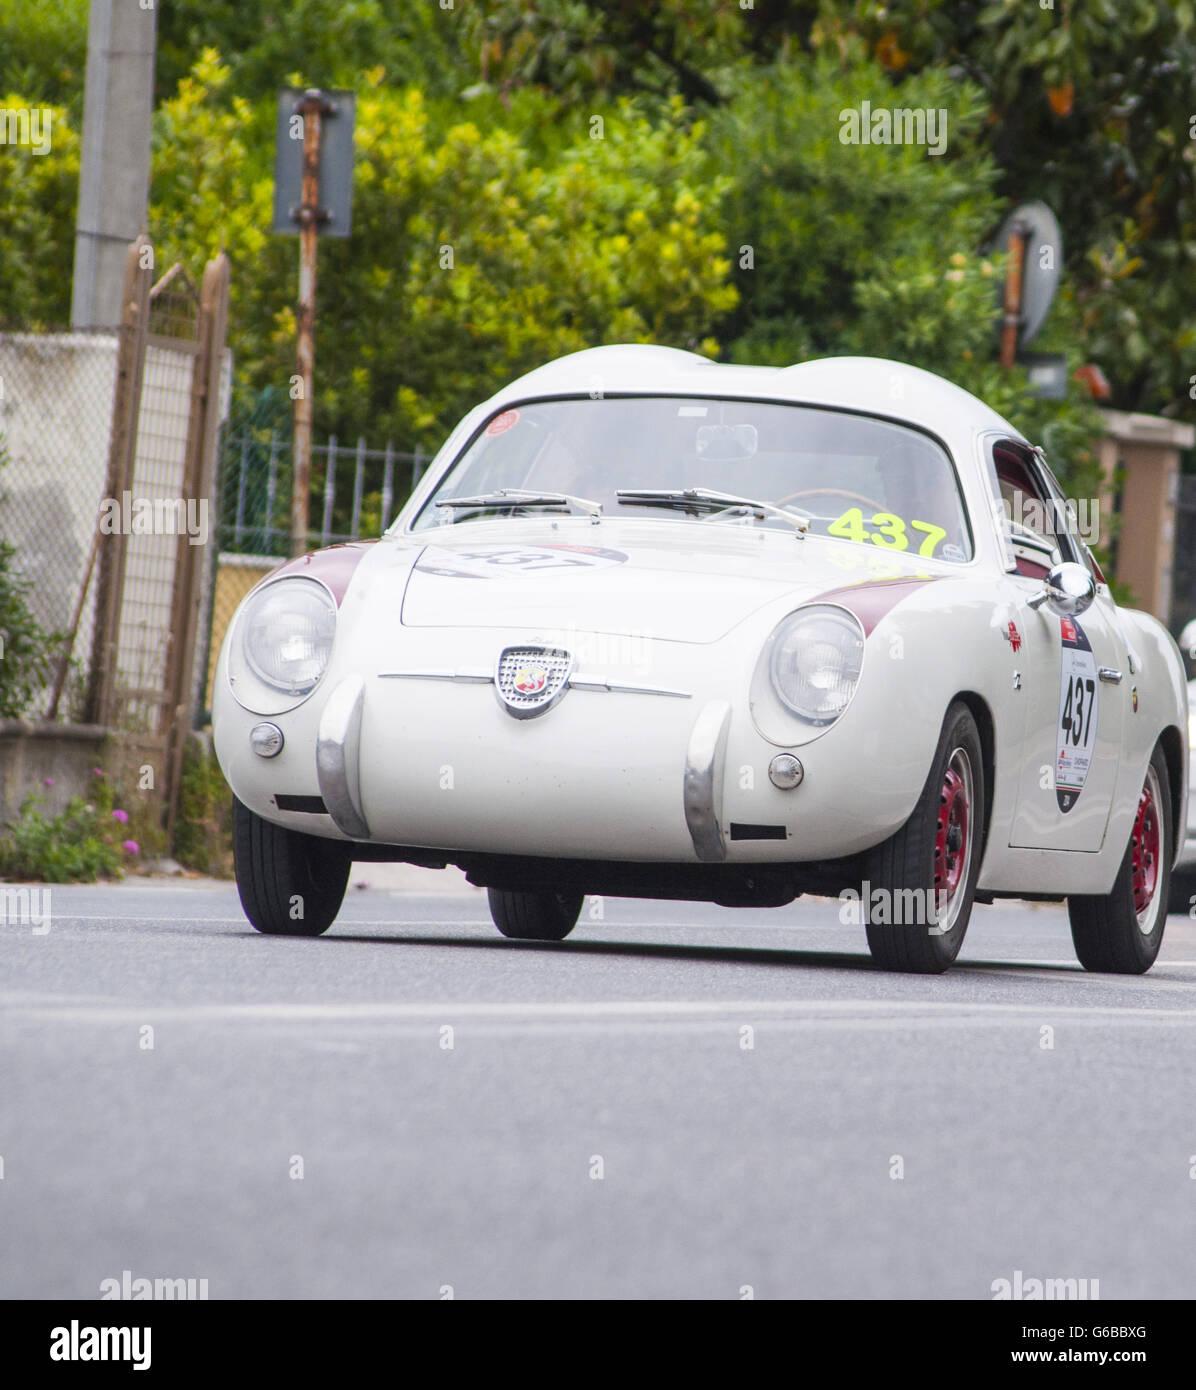 FANO, ITALY - MAY 16 :Abarth FIAT 750 berlinetta Zagato old racing car in rally Mille Miglia 2014 the famous italian - Stock Image